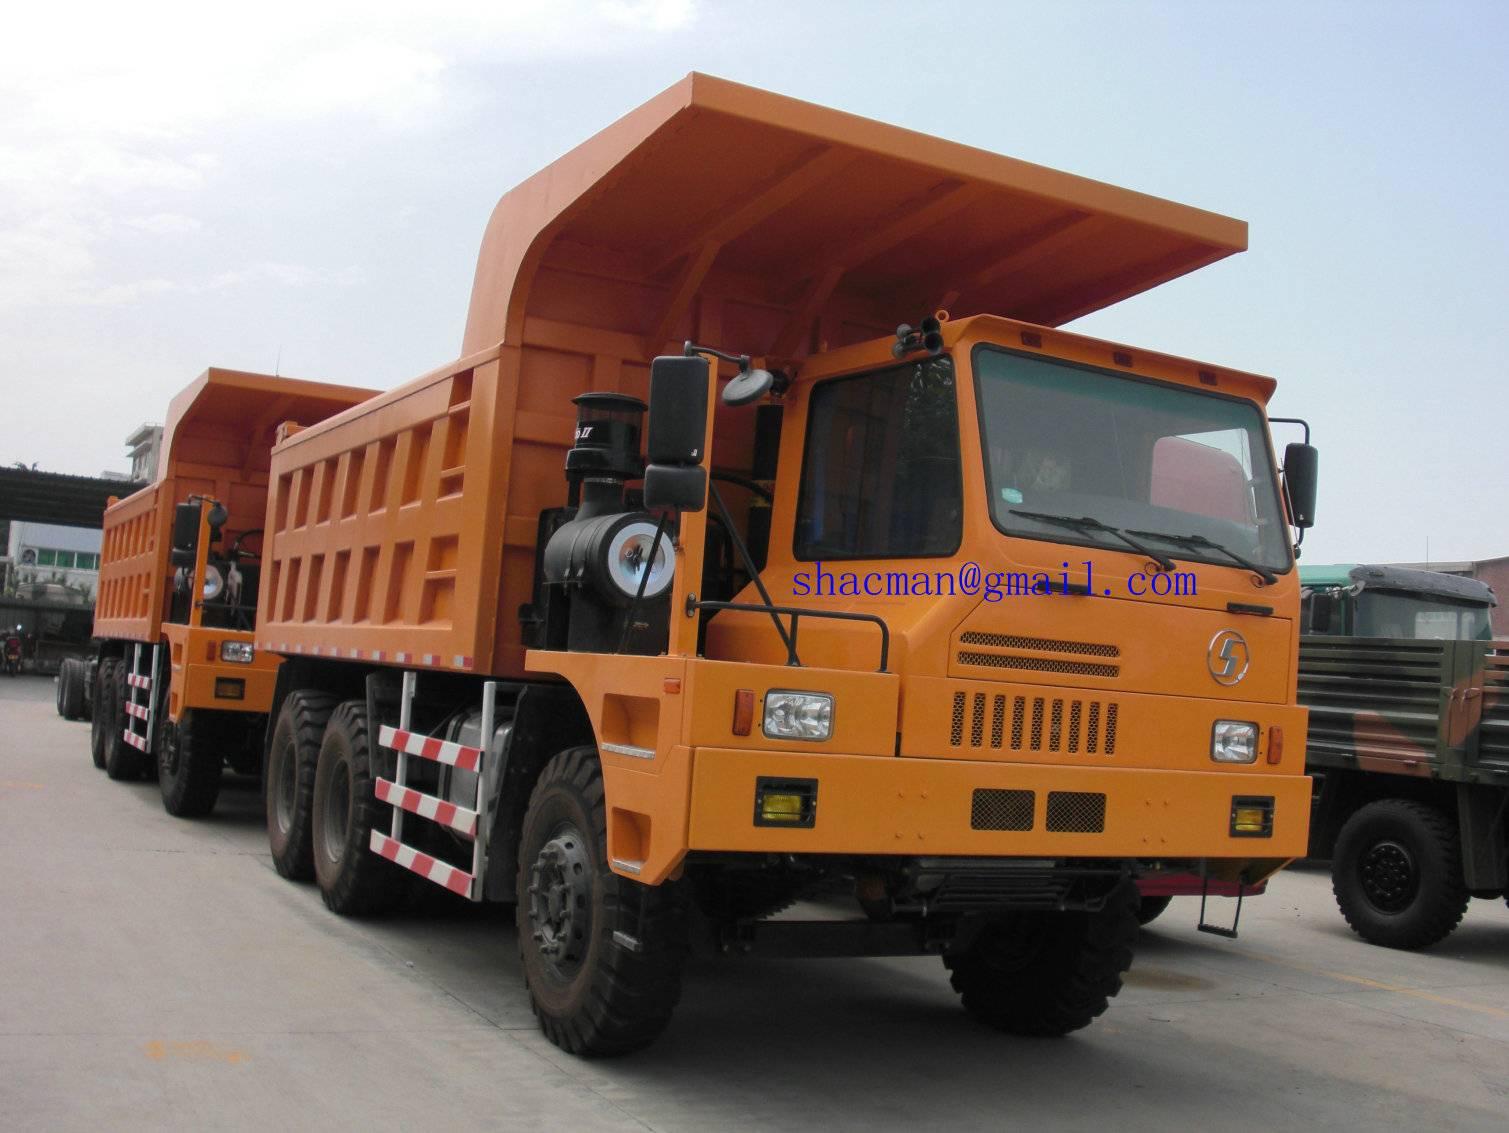 Shacman Off-road Mining Dump Truck